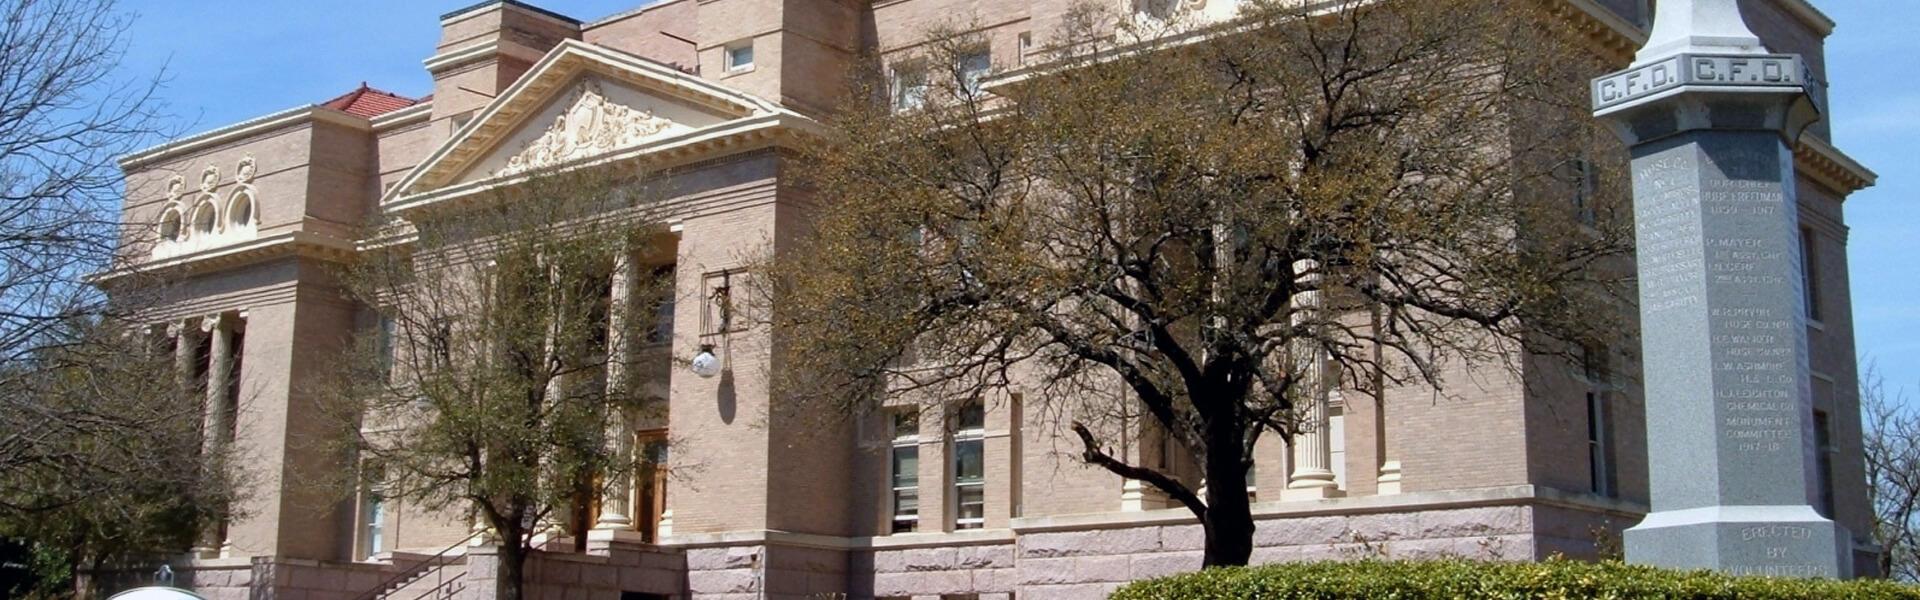 Car Insurance Quotes in Navarro County Texas